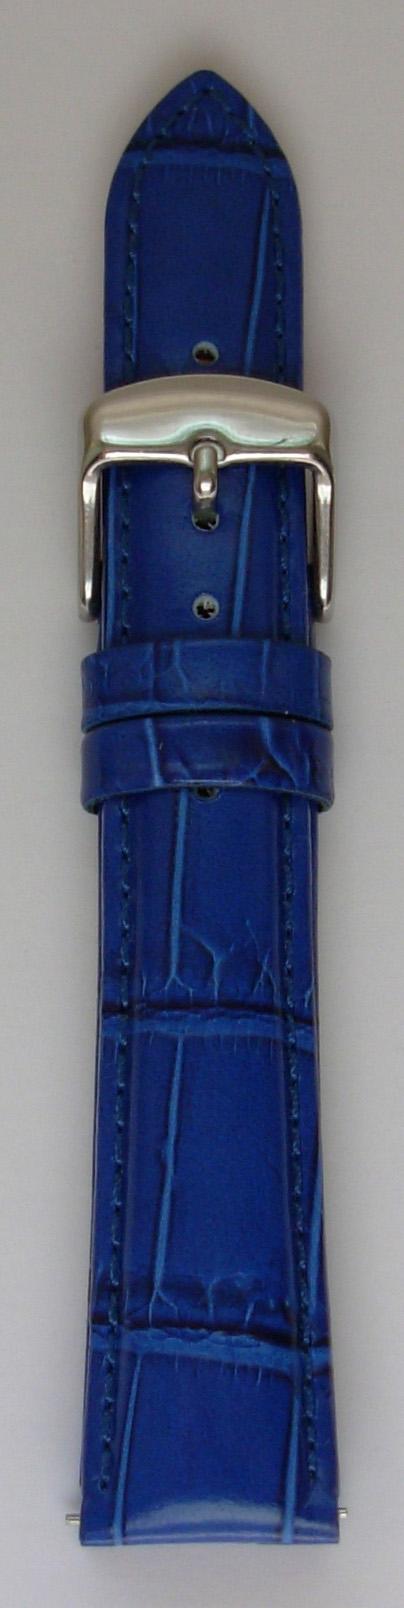 Besoin d'info sur un vielle LIP 18mmPastelBlue